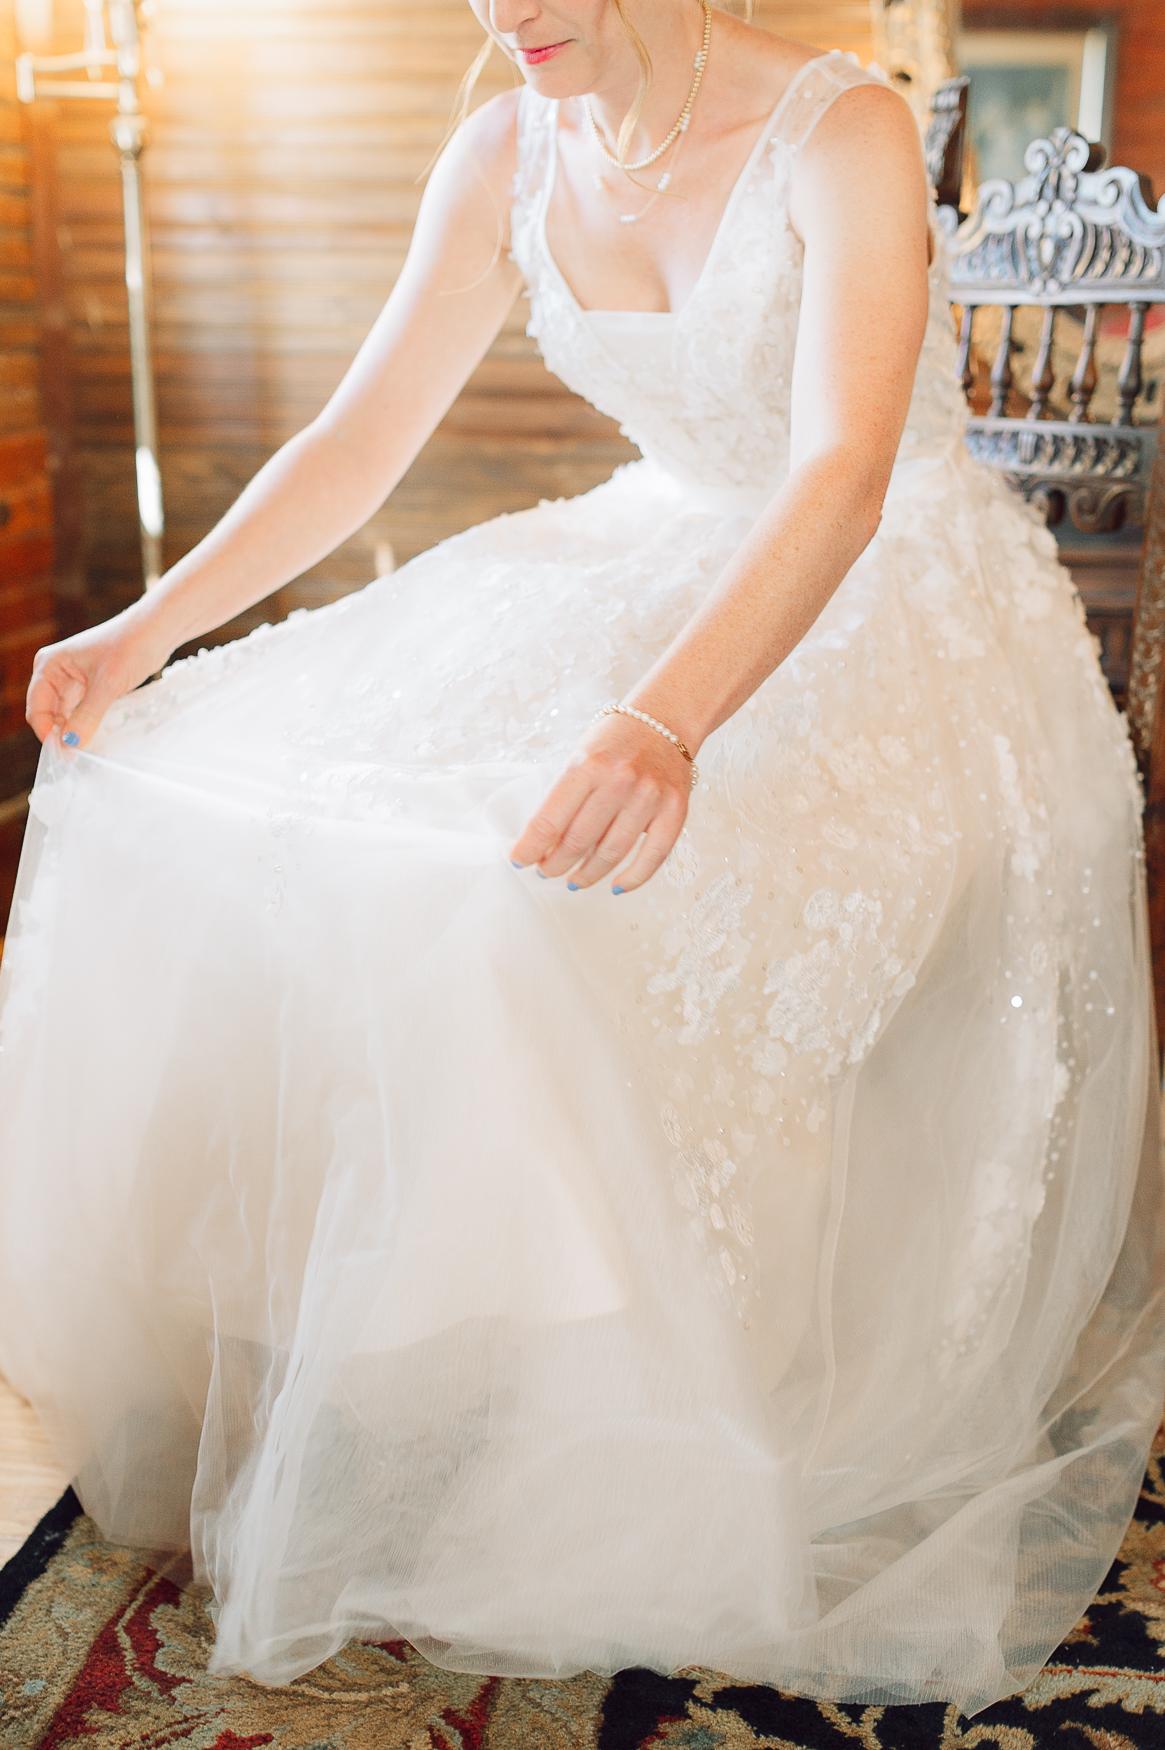 virginiawedding_theGlasgowFarm_rusticwedding_fredericksburg_youseephotography_CarolineDale (21).jpg